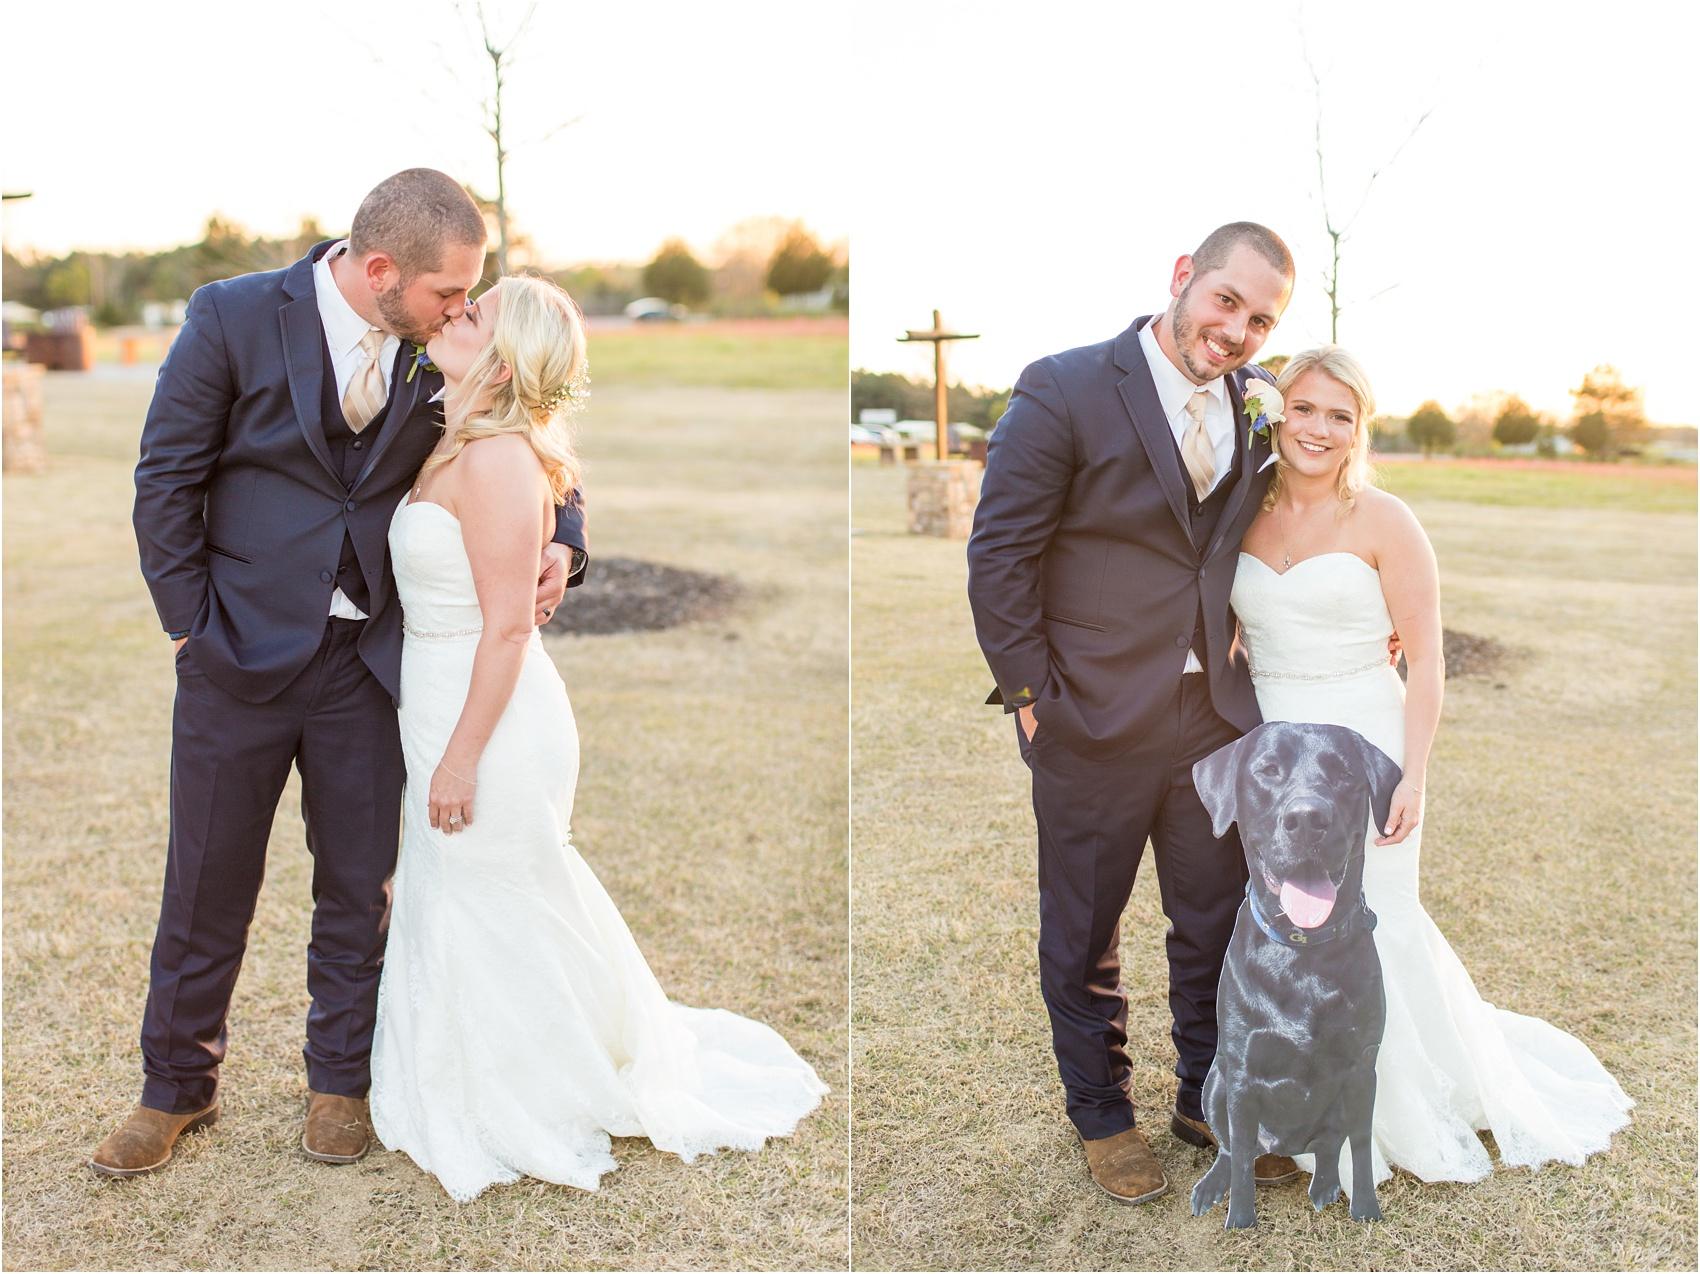 Savannah Eve Photography- Wade Wedding-67.jpg